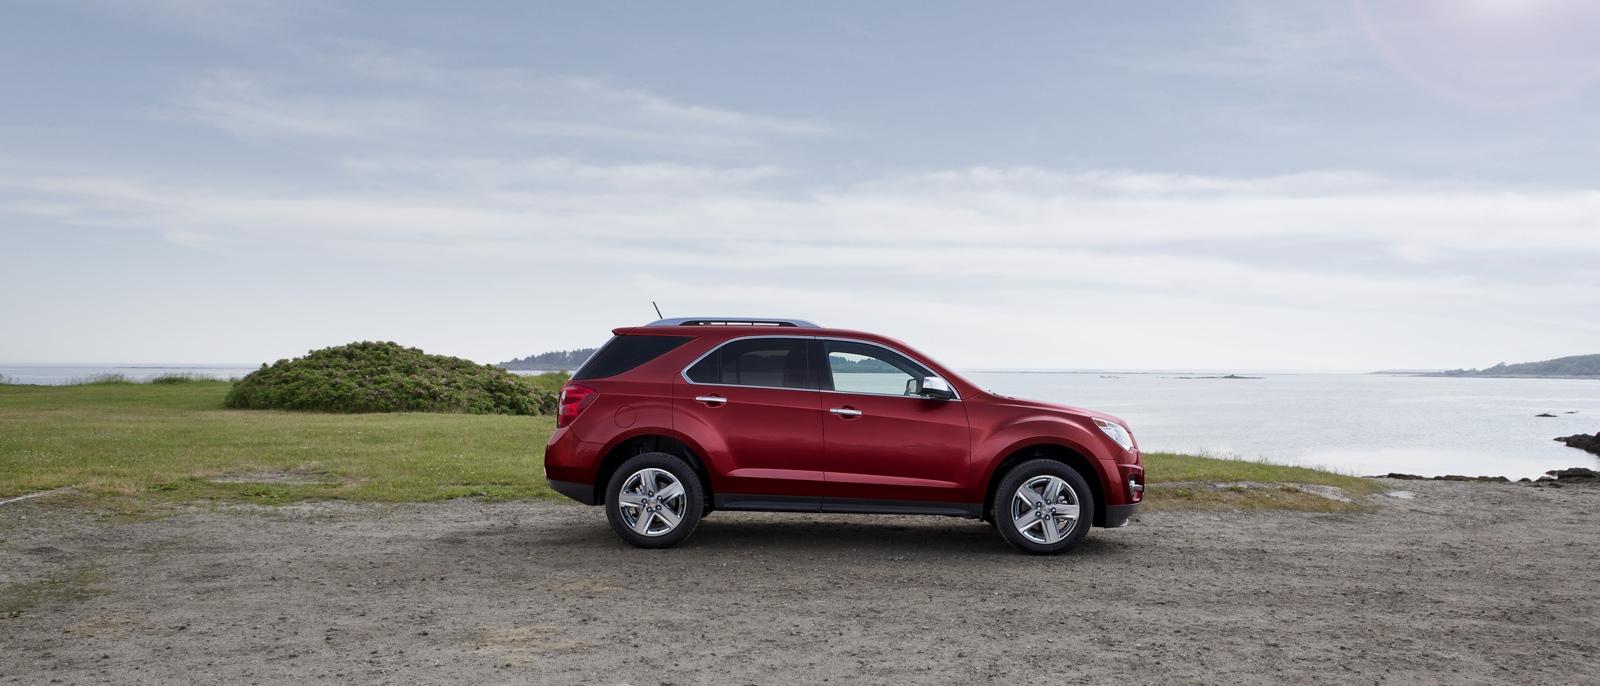 2015 Chevrolet Equinox profile